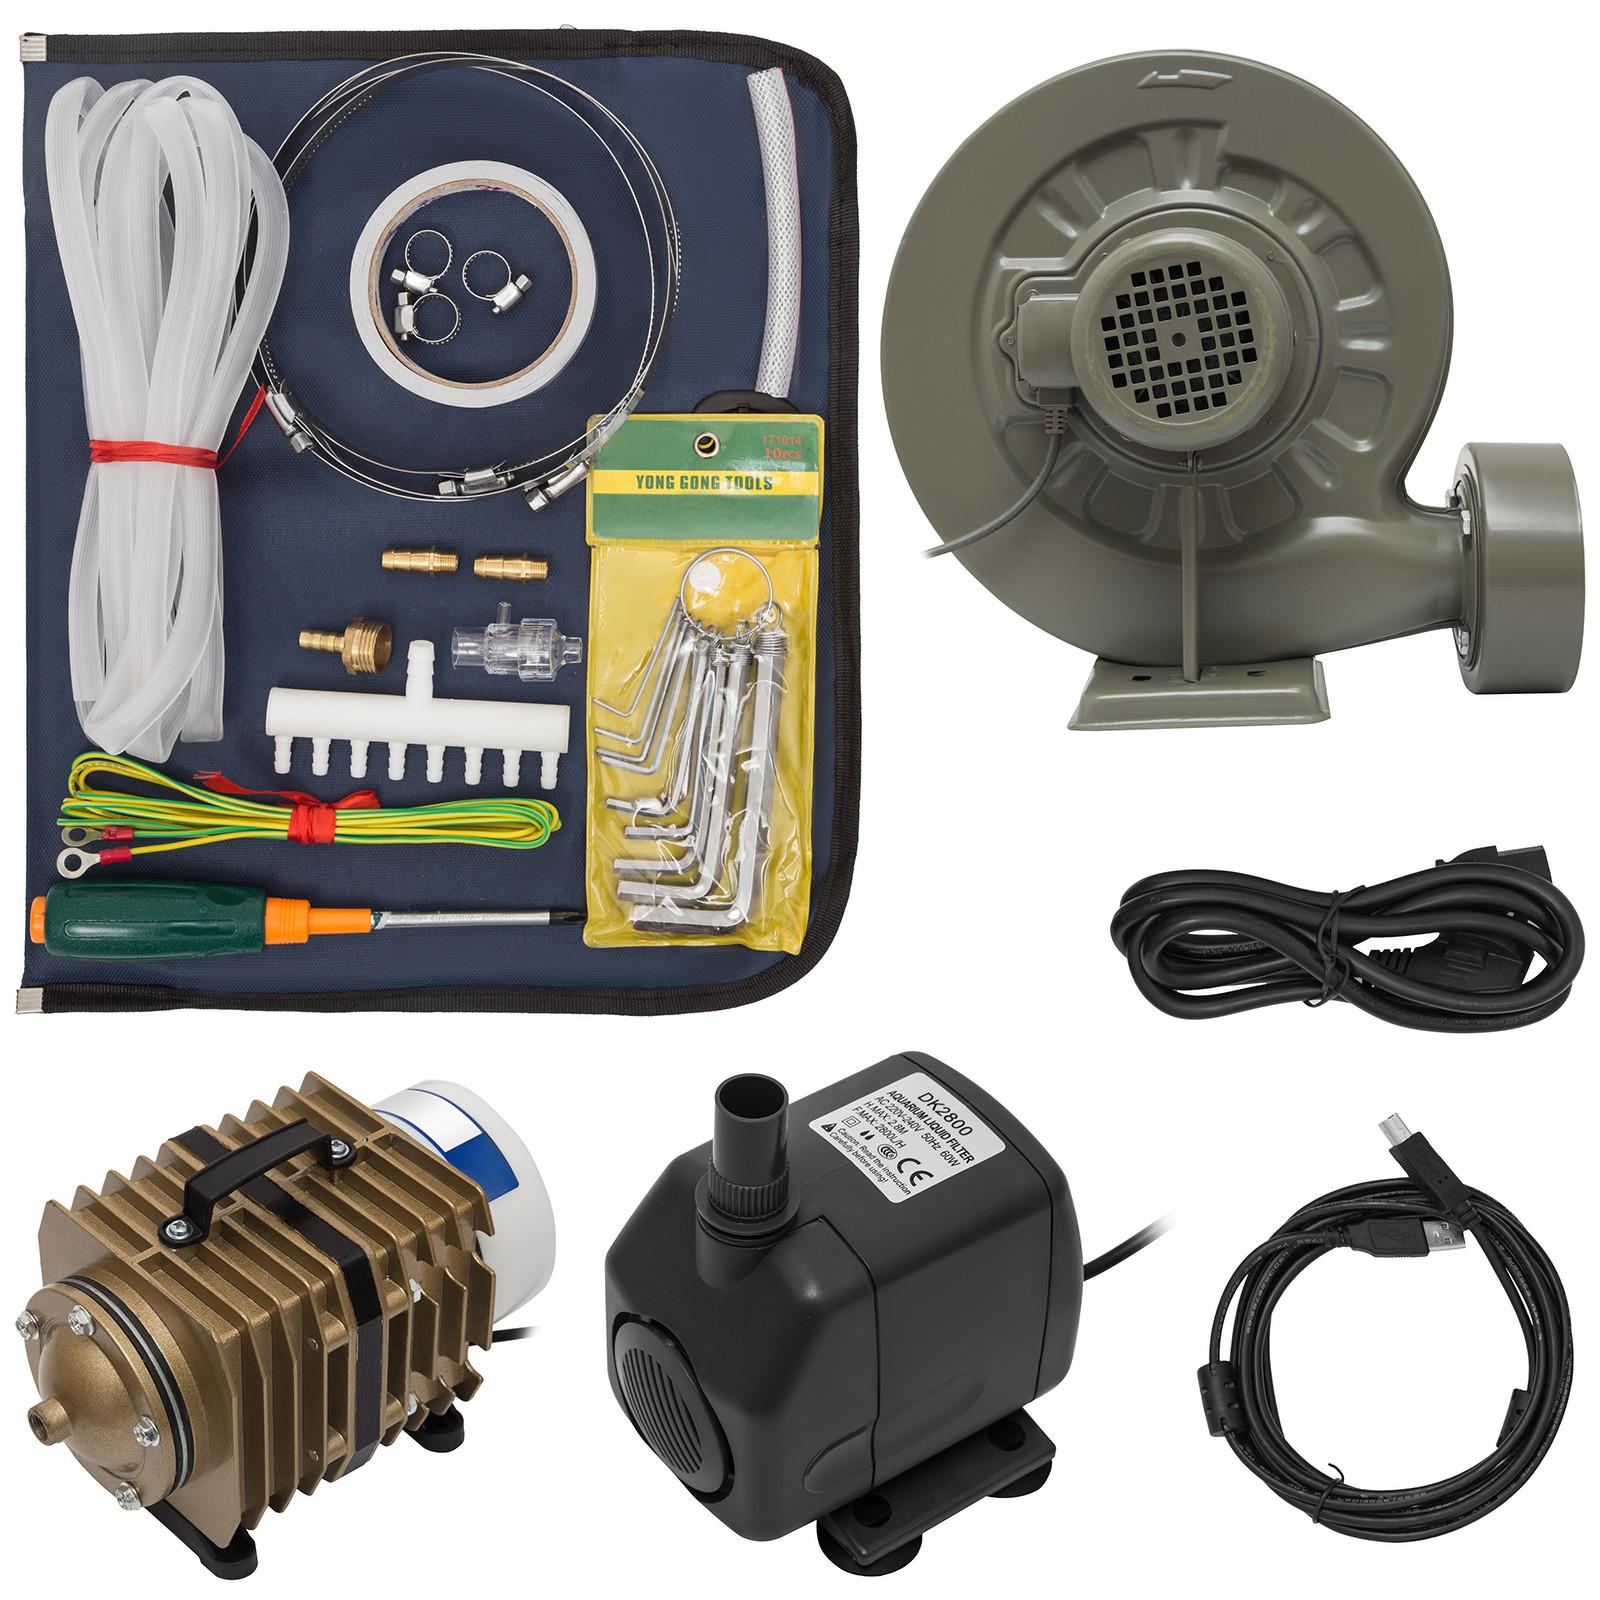 Macchina-per-Incisione-Laser-CO2-40-130W-Asse-Rotante-Tagliatrice-Incisore miniatura 53